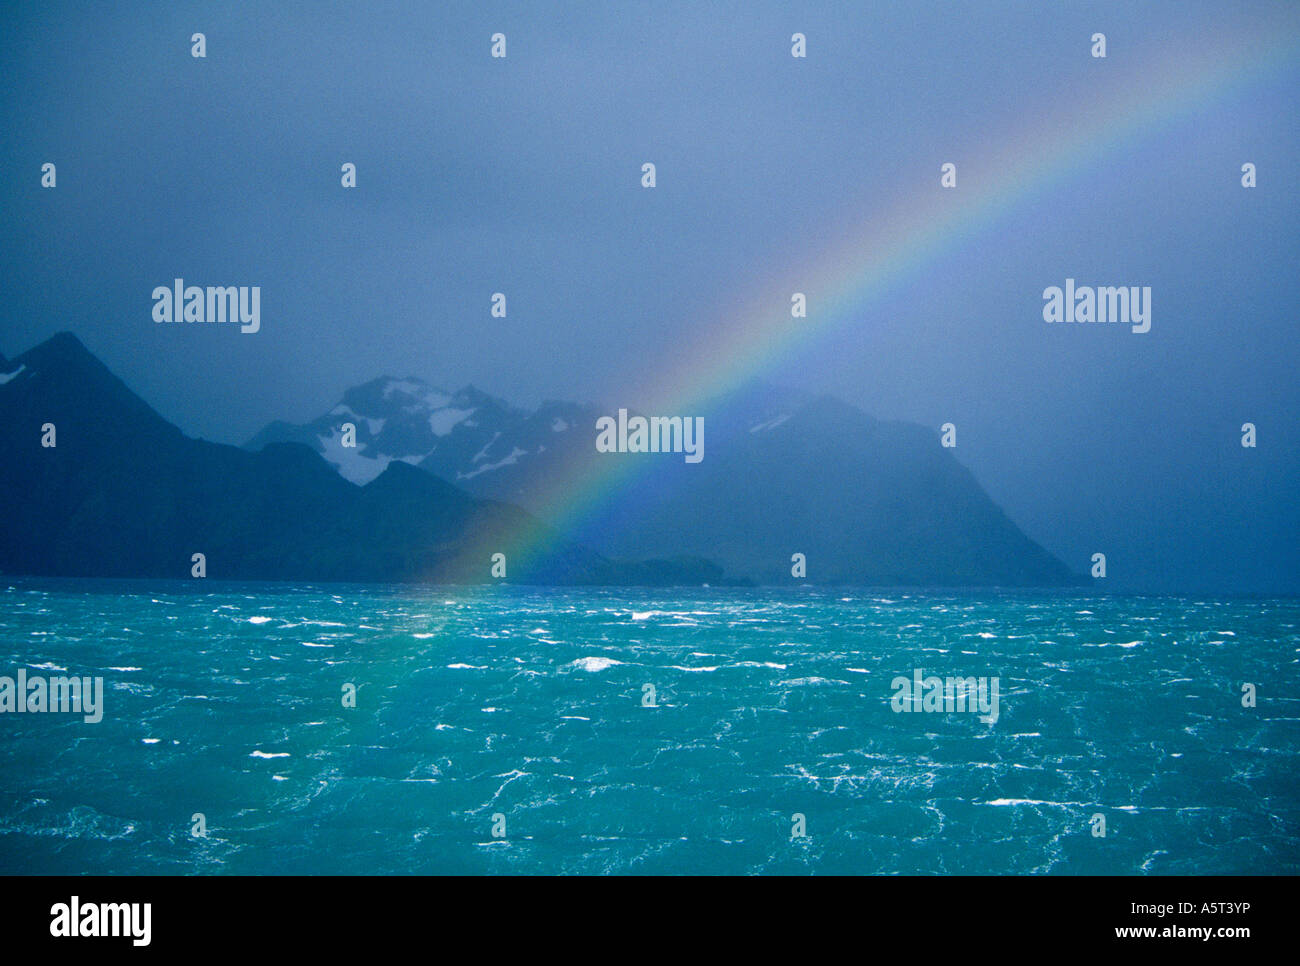 Rainbow over South Georgia Island Subantarctic - Stock Image